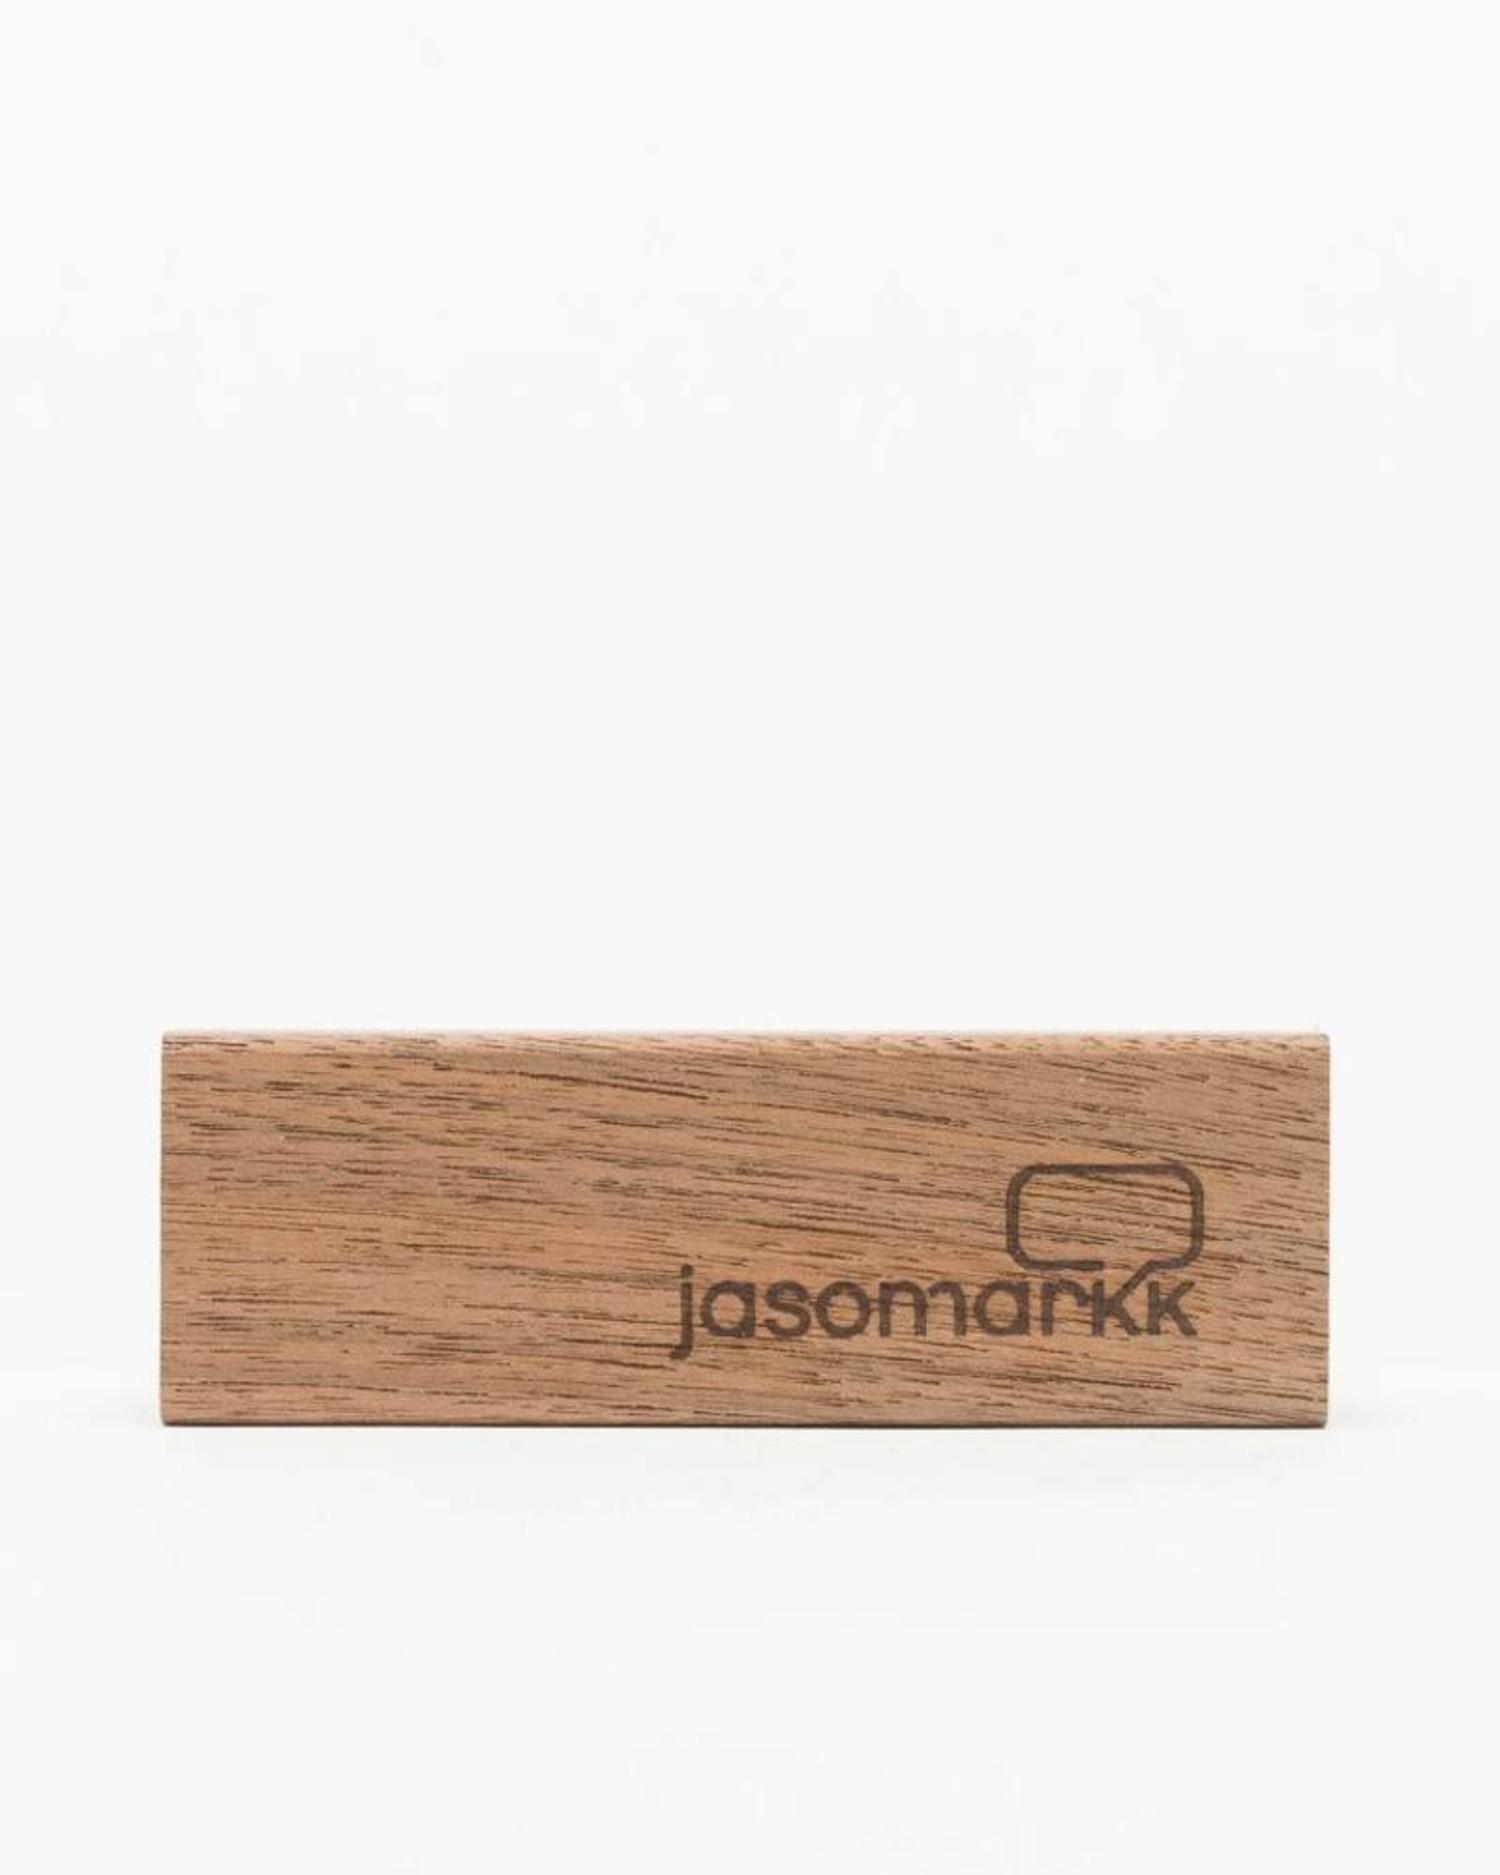 Jason Markk Premium Sneaker Schoonmaak Borstel (Zacht)